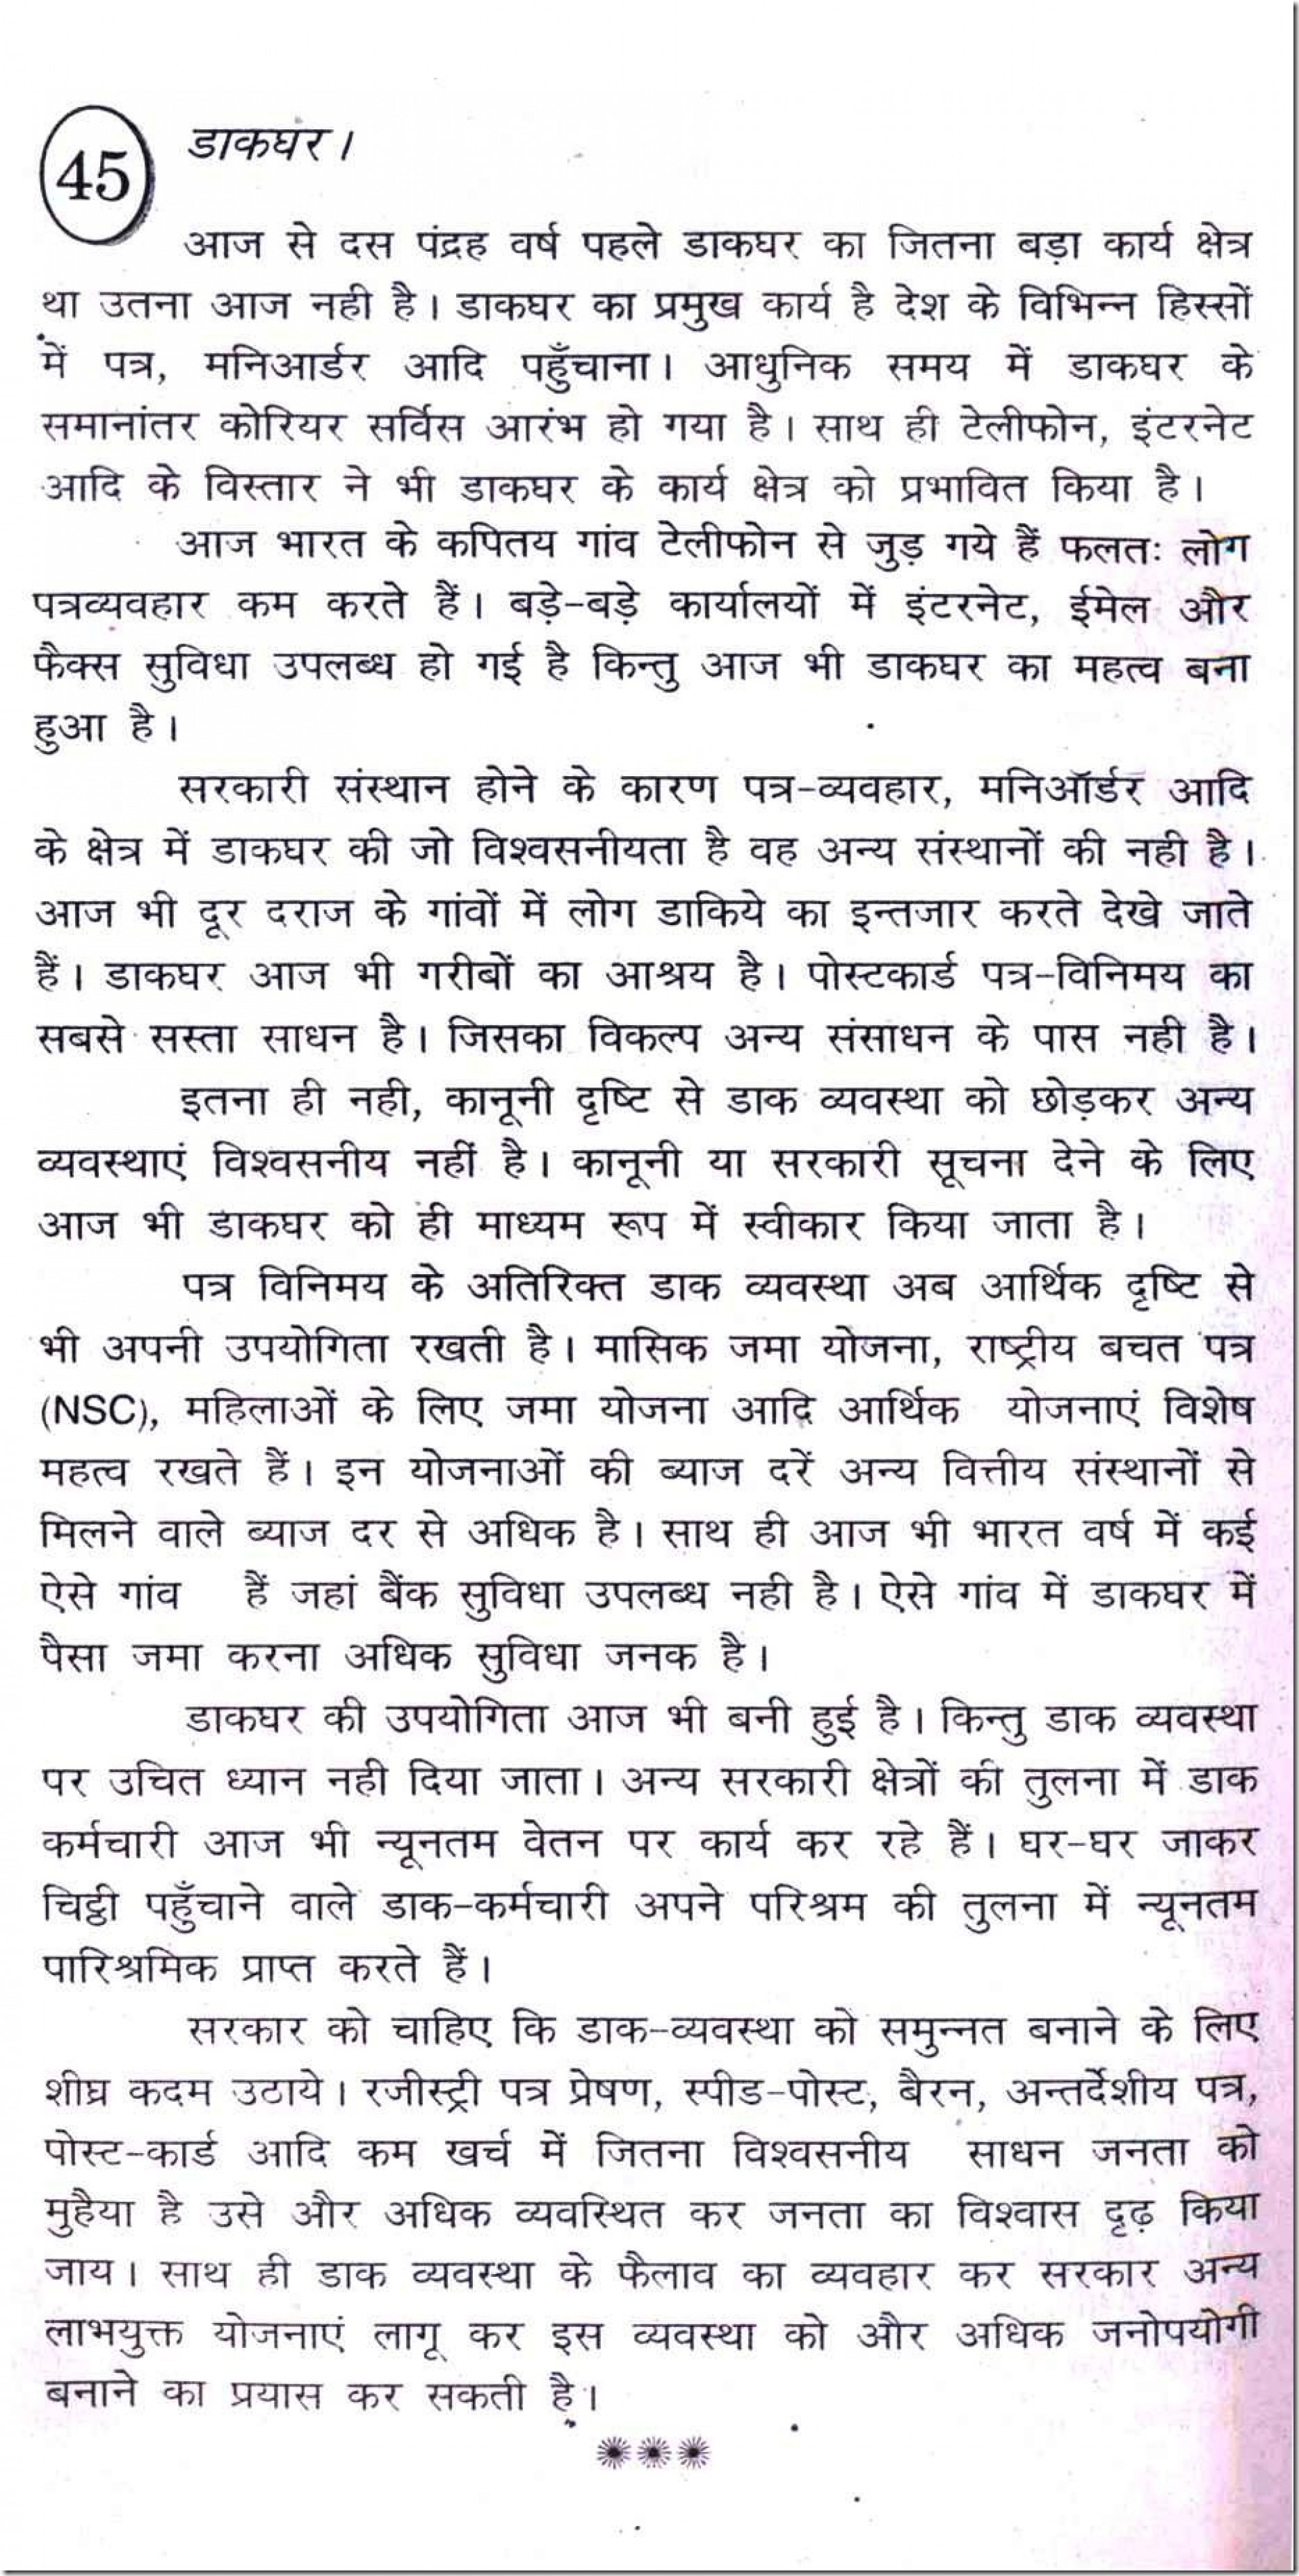 018 Hard Work Essay Example Wonderful Pdf Pays Off In Hindi Writing 1920